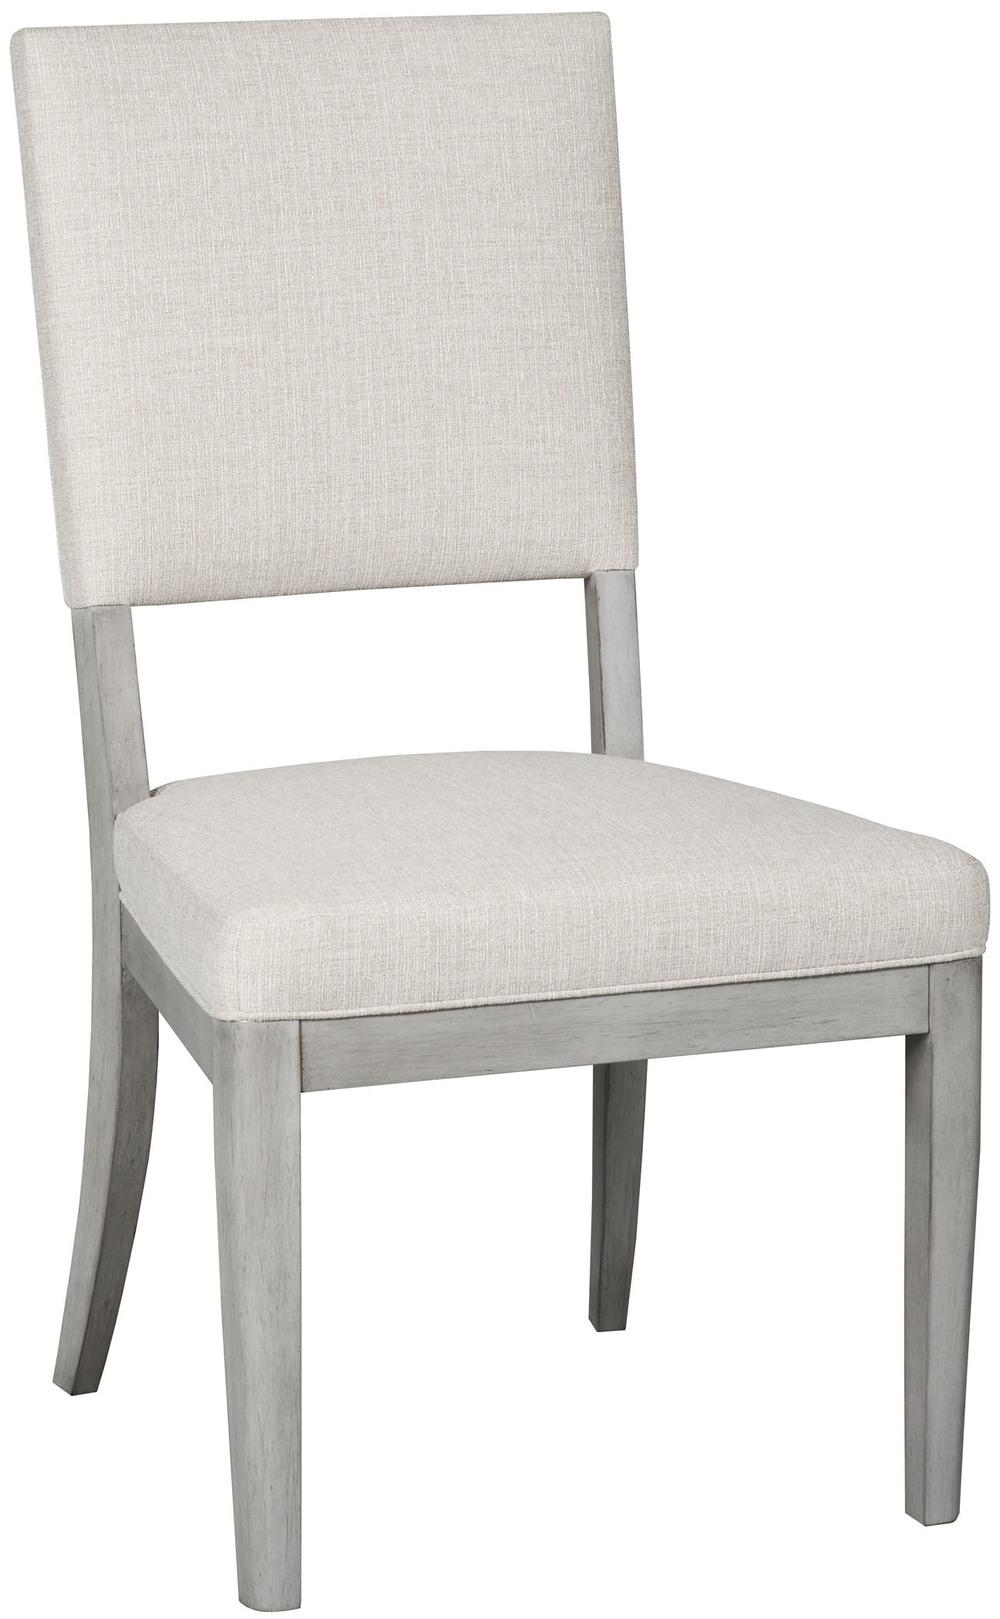 Vanguard Furniture - Juliet Side Chair